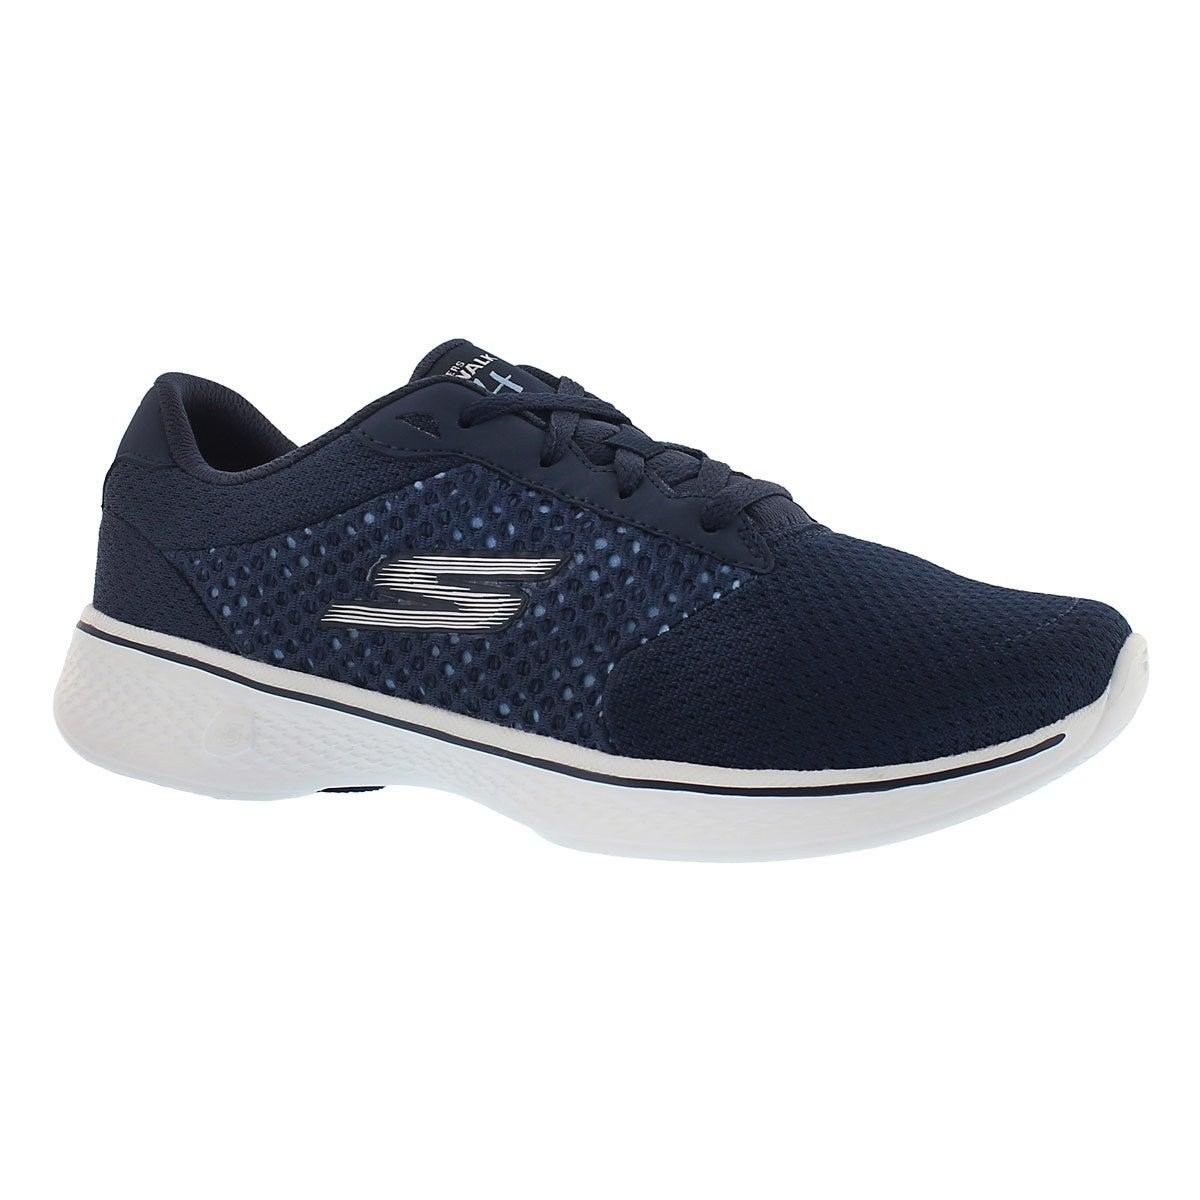 Lds GO Walk 4 nvy lace up walking shoe